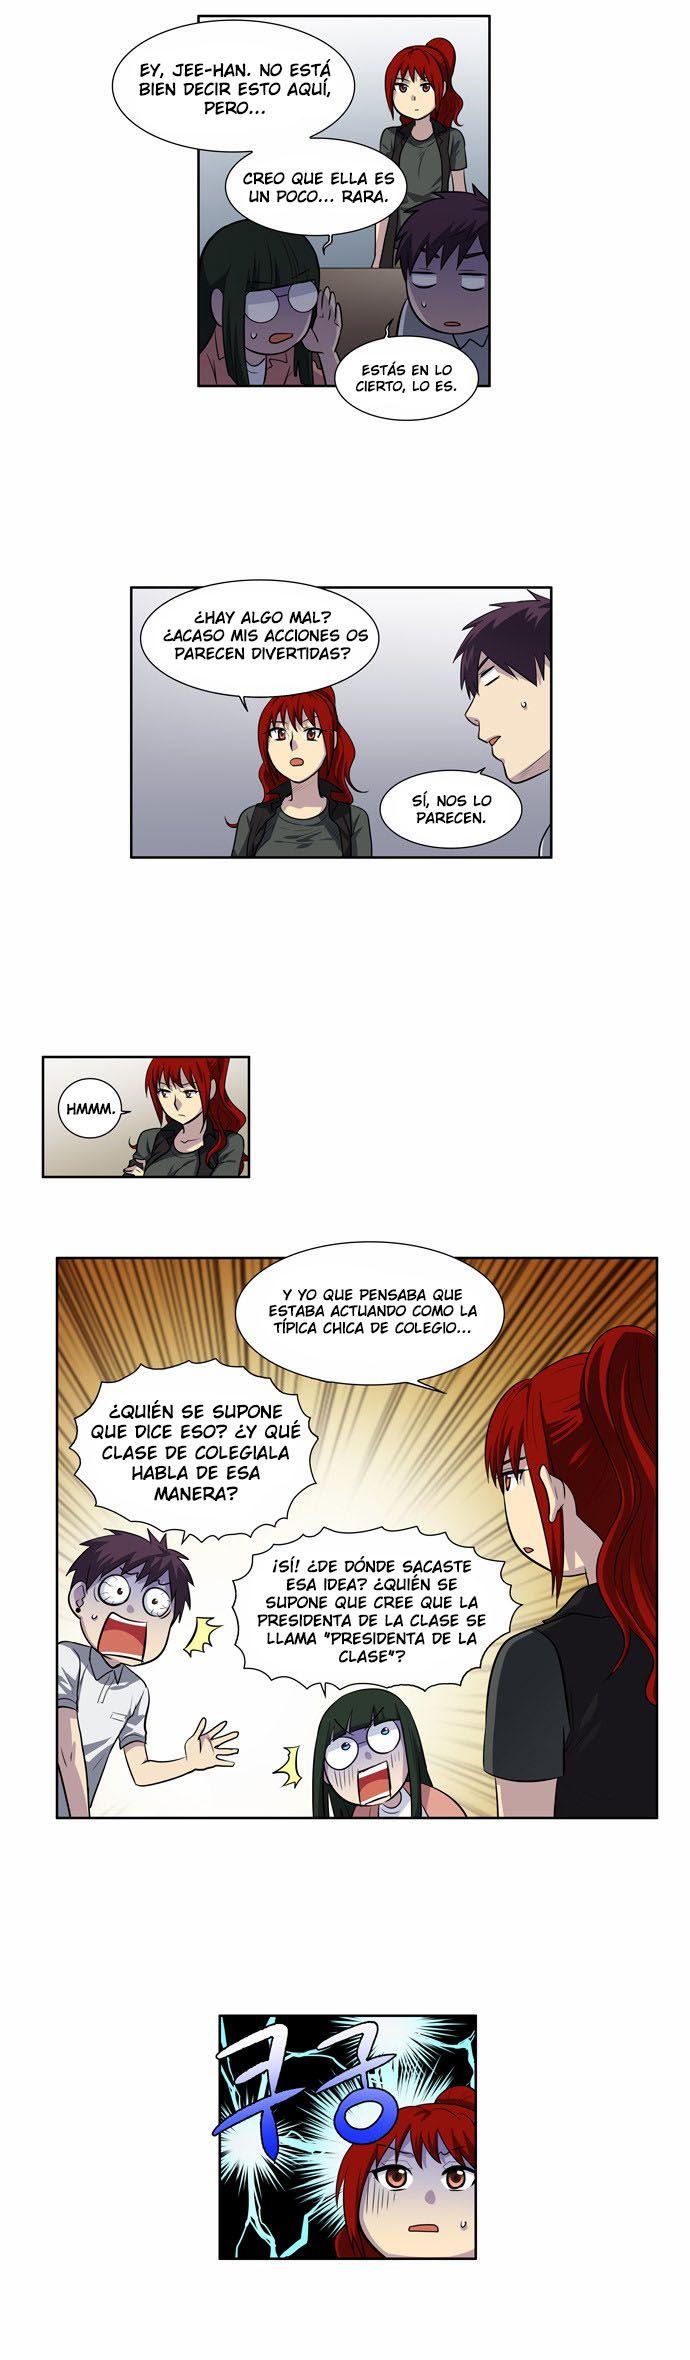 https://c5.ninemanga.com/es_manga/61/1725/474226/de6694a2fd0708309dbf0affc9deeab9.jpg Page 18